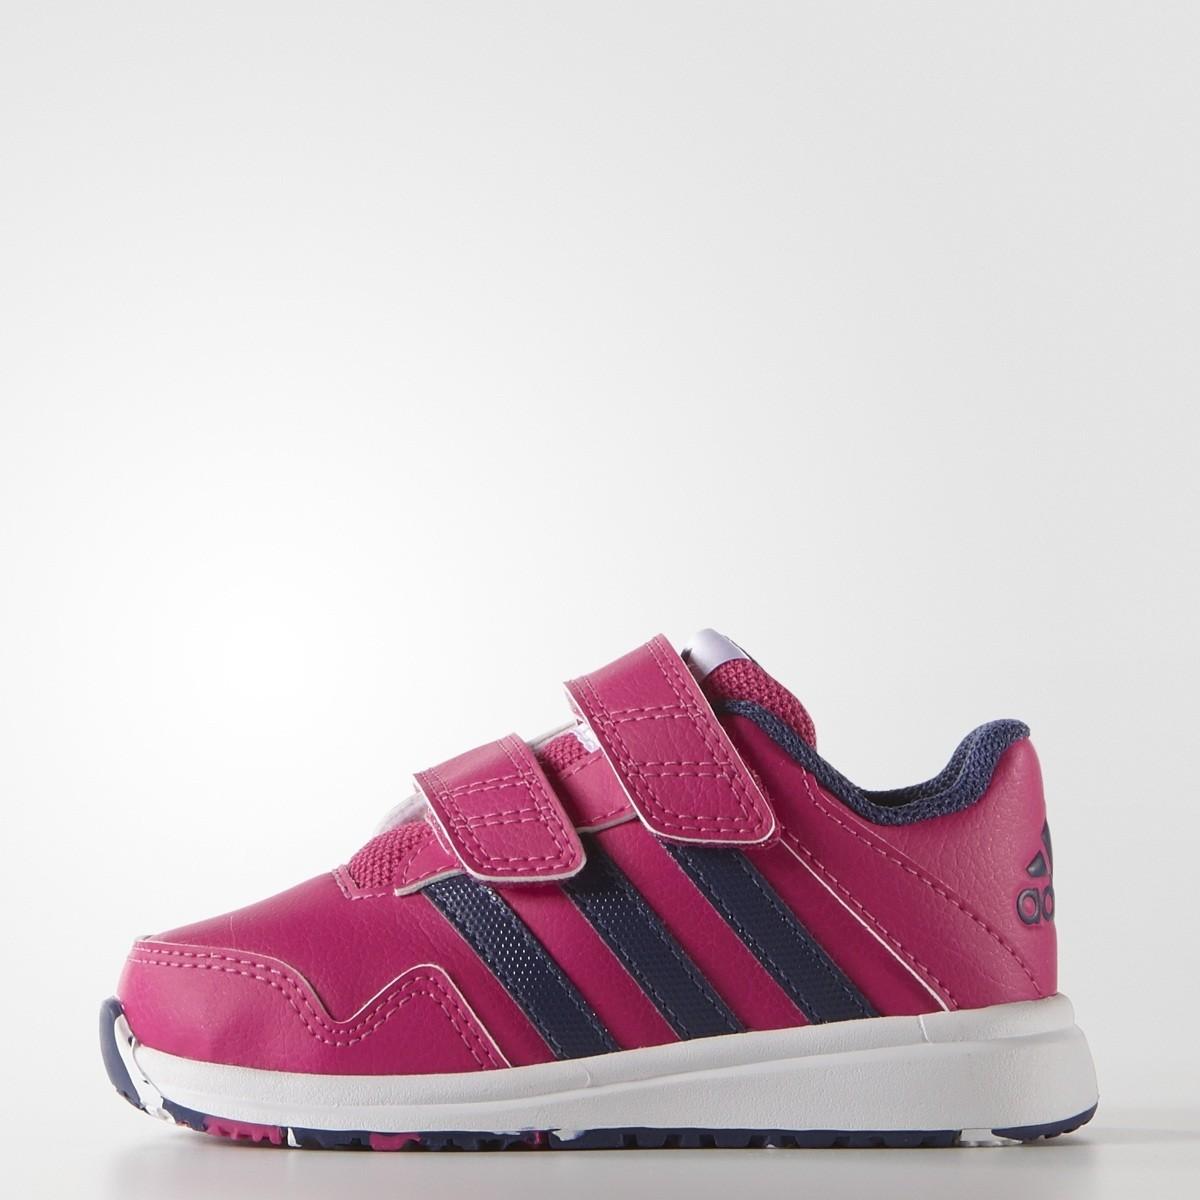 Dětské tenisky adidas Snice 4 CF I  07e2ae5992